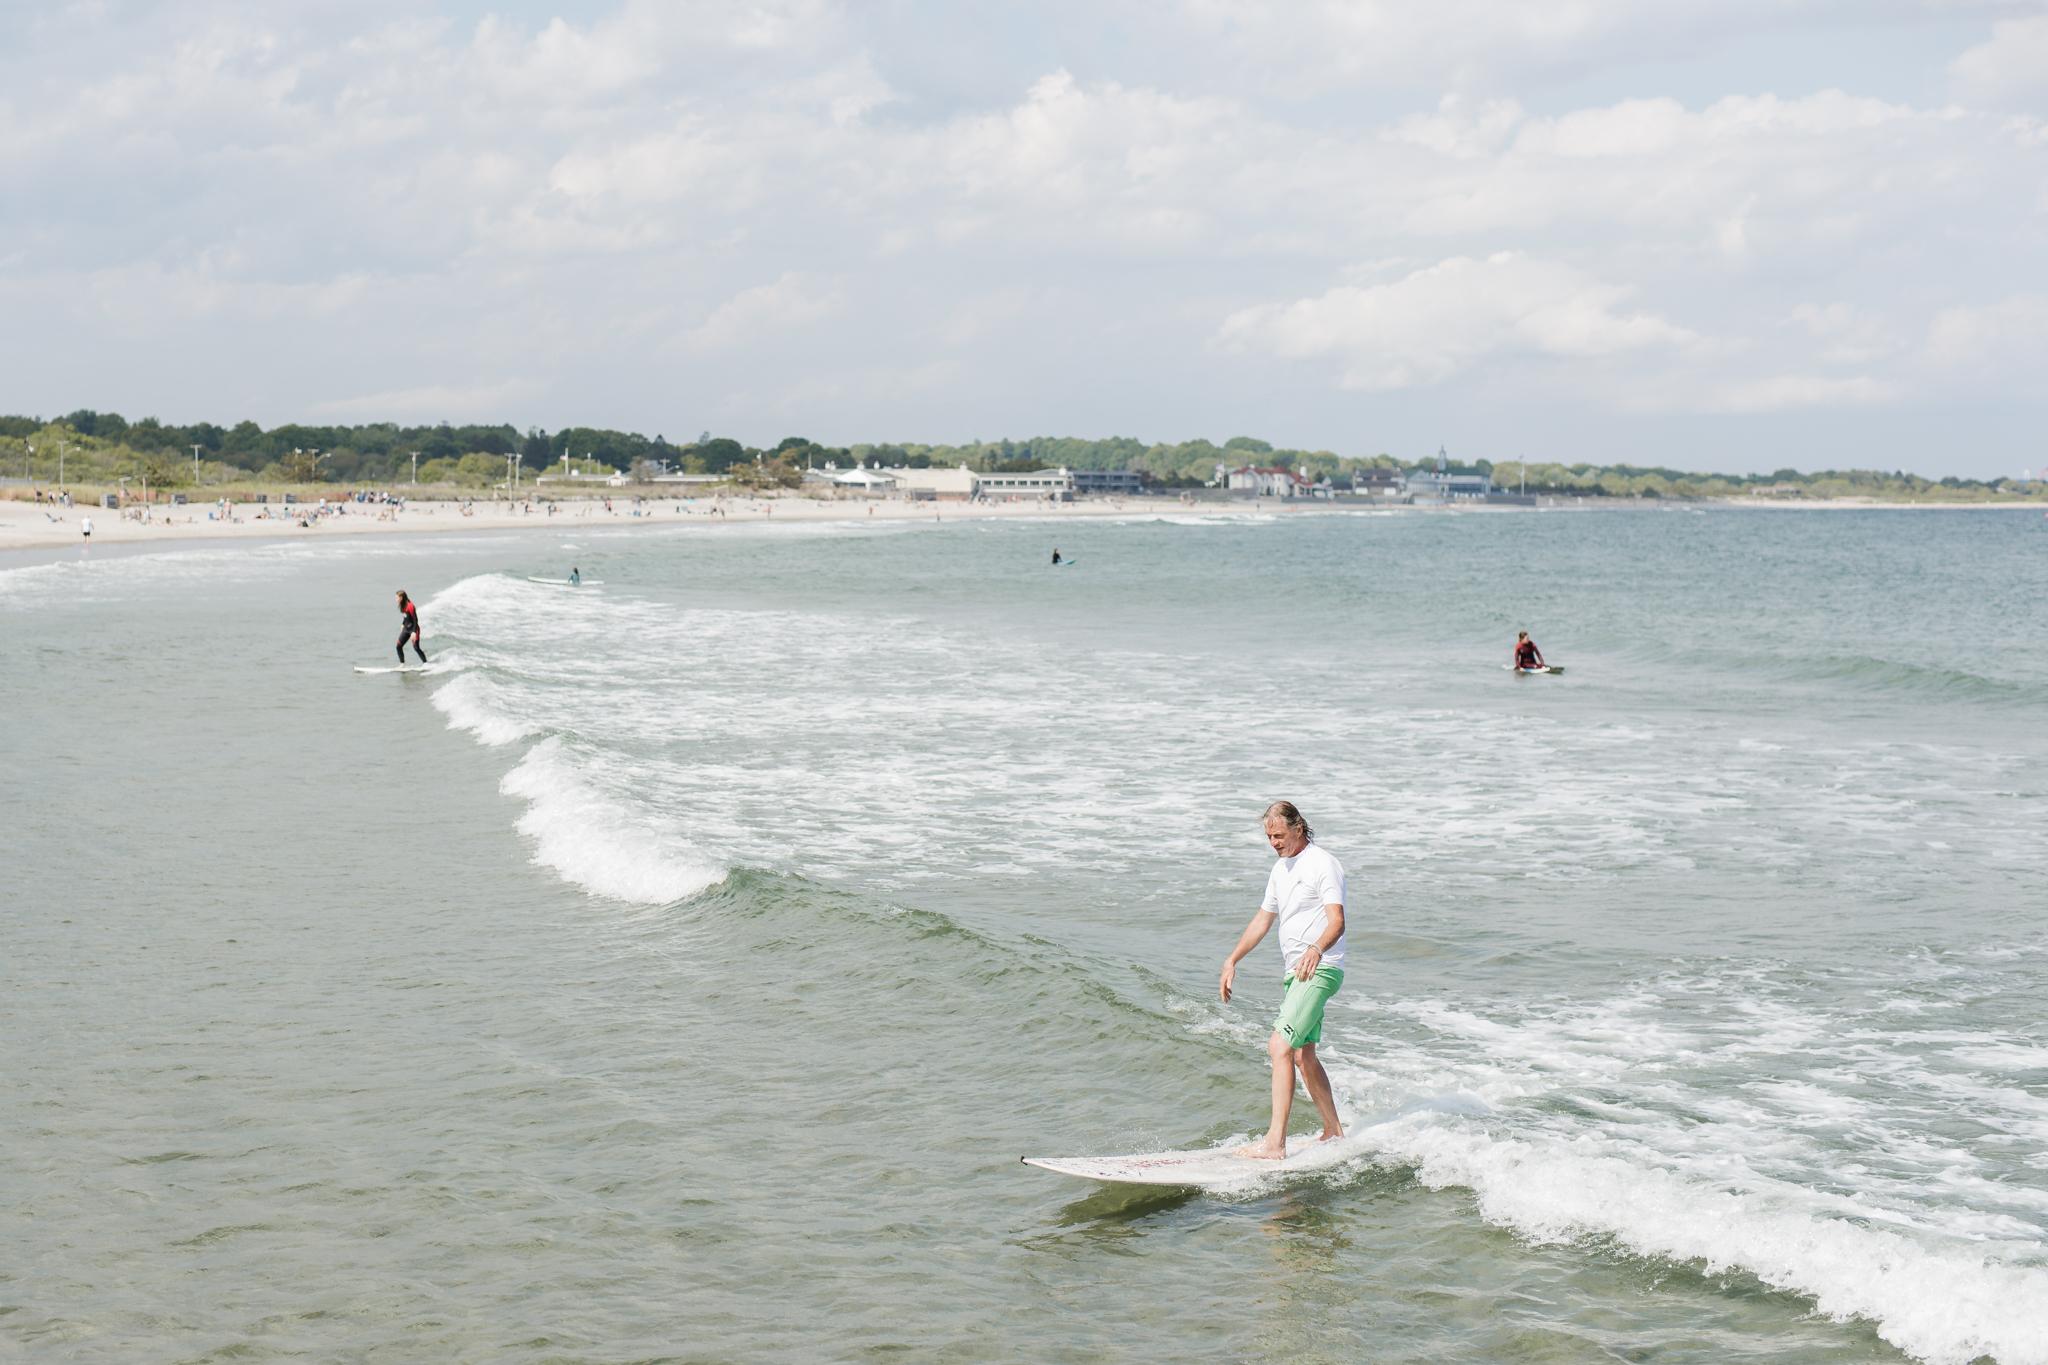 surfers at Narragansett Town Beach in Narragansett, RI